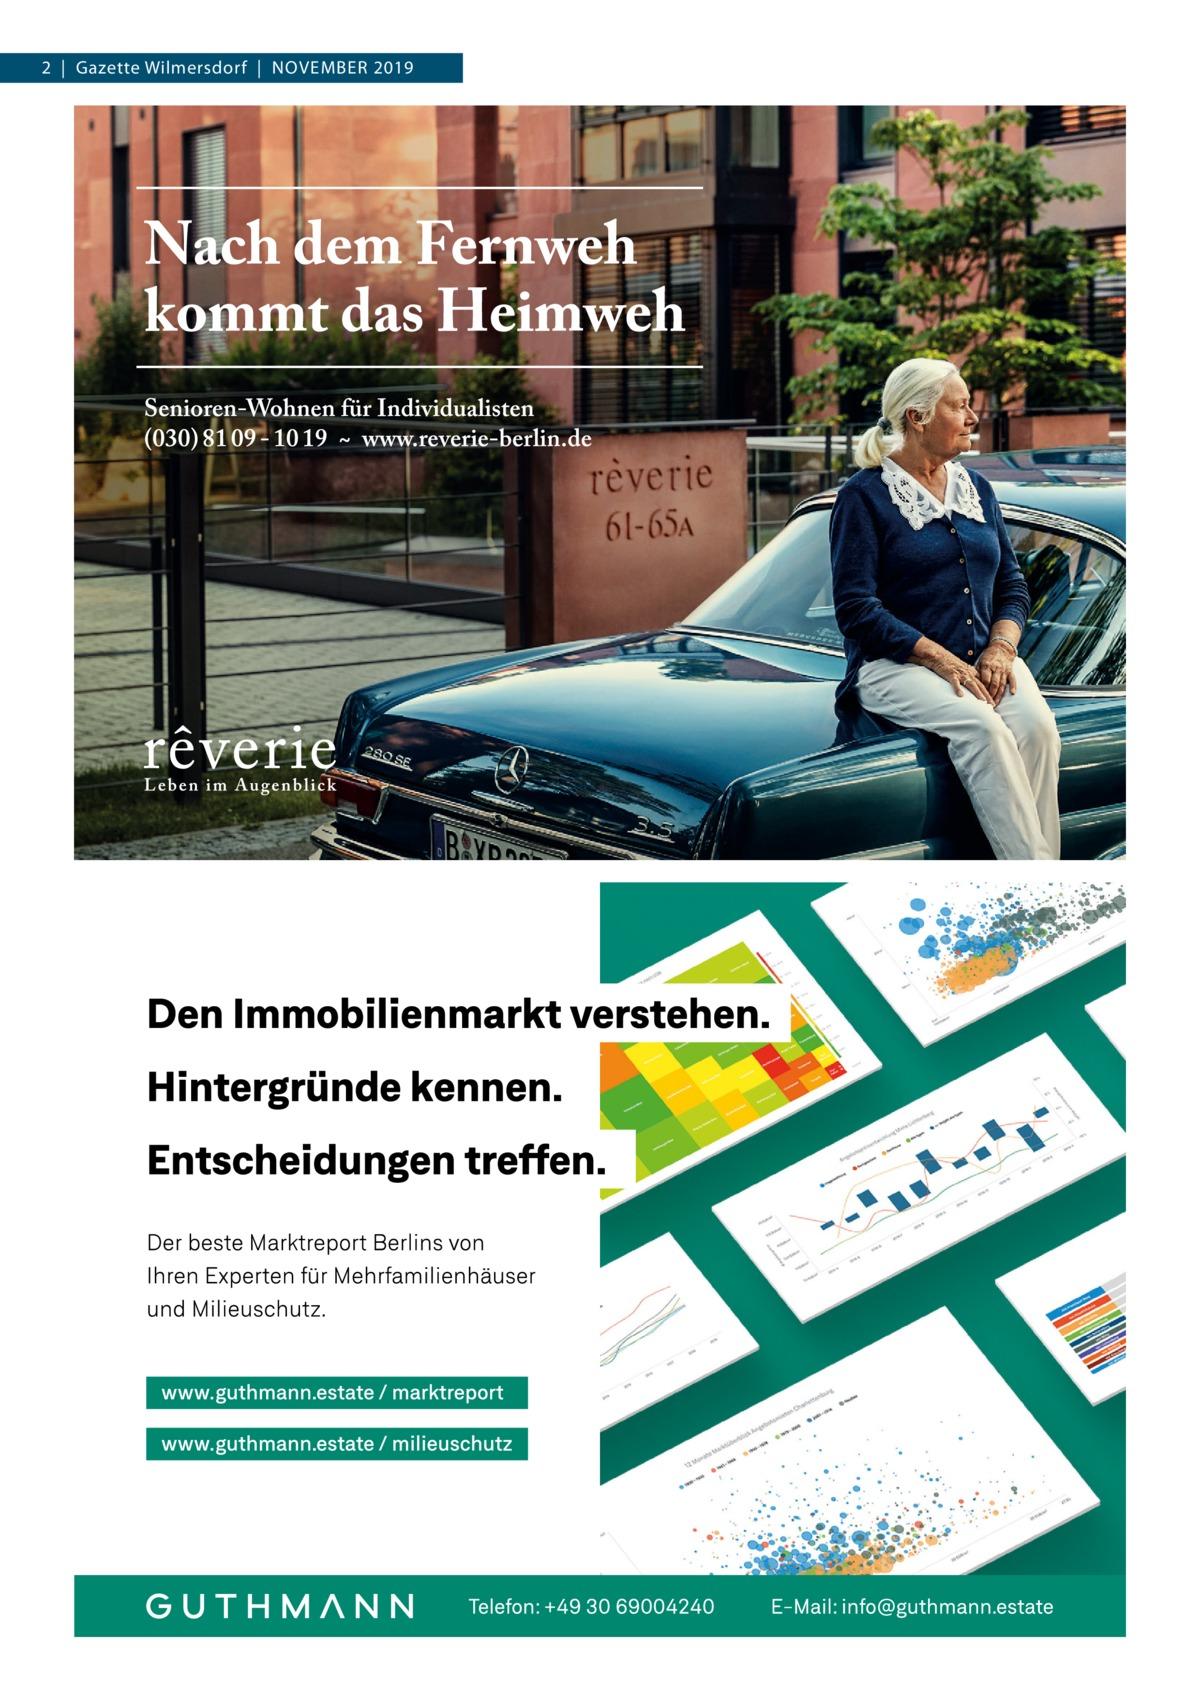 2 Gazette Wilmersdorf November 2019